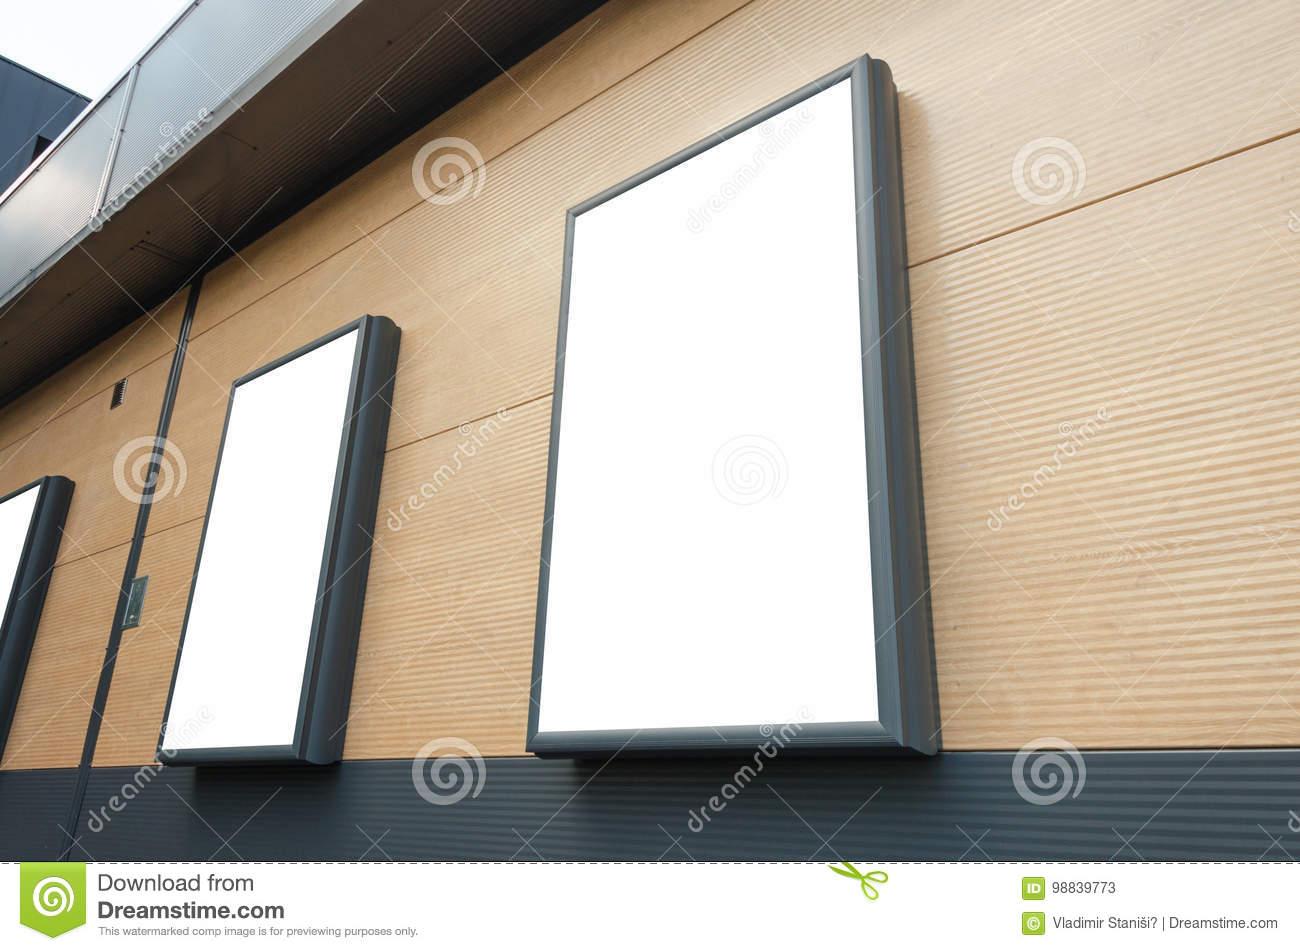 topo_billboards-shopping-center-wall-mockup-marketing-campaign-promotion-billboards-shopping-center-